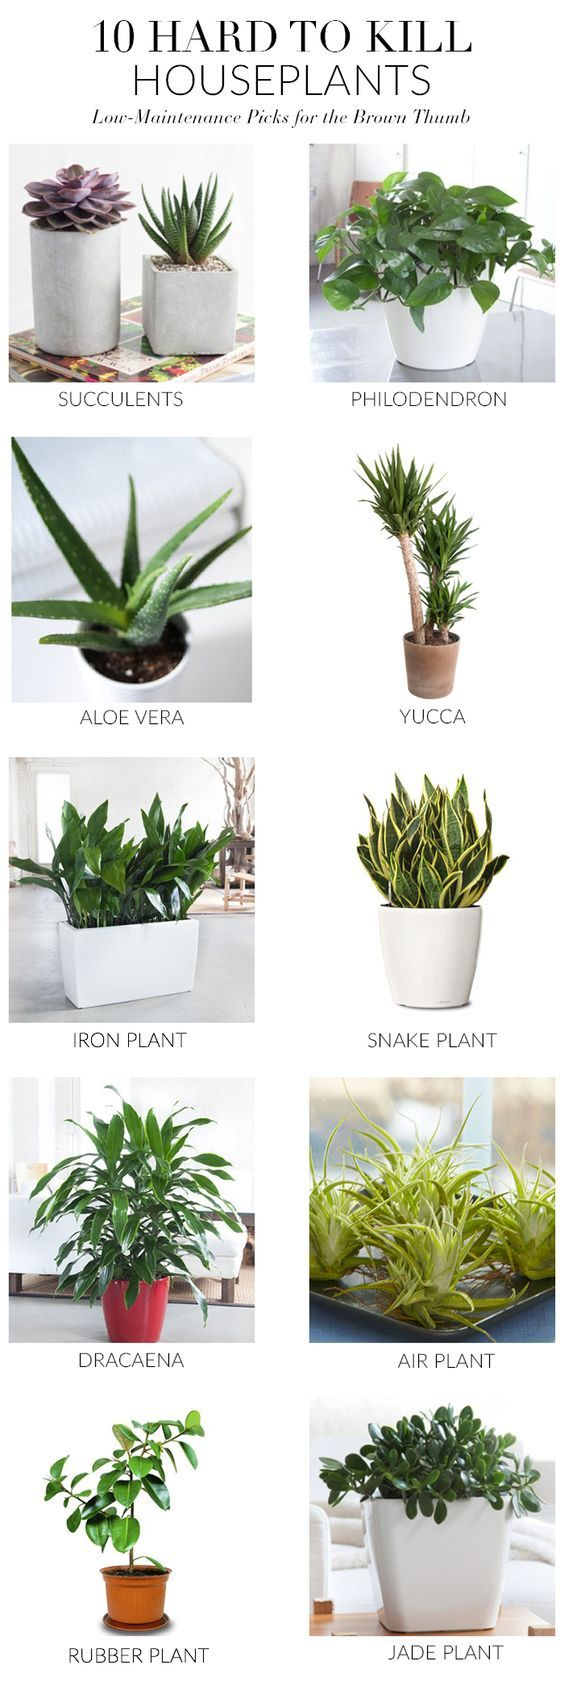 hard to kill houseplants plants and greenery in